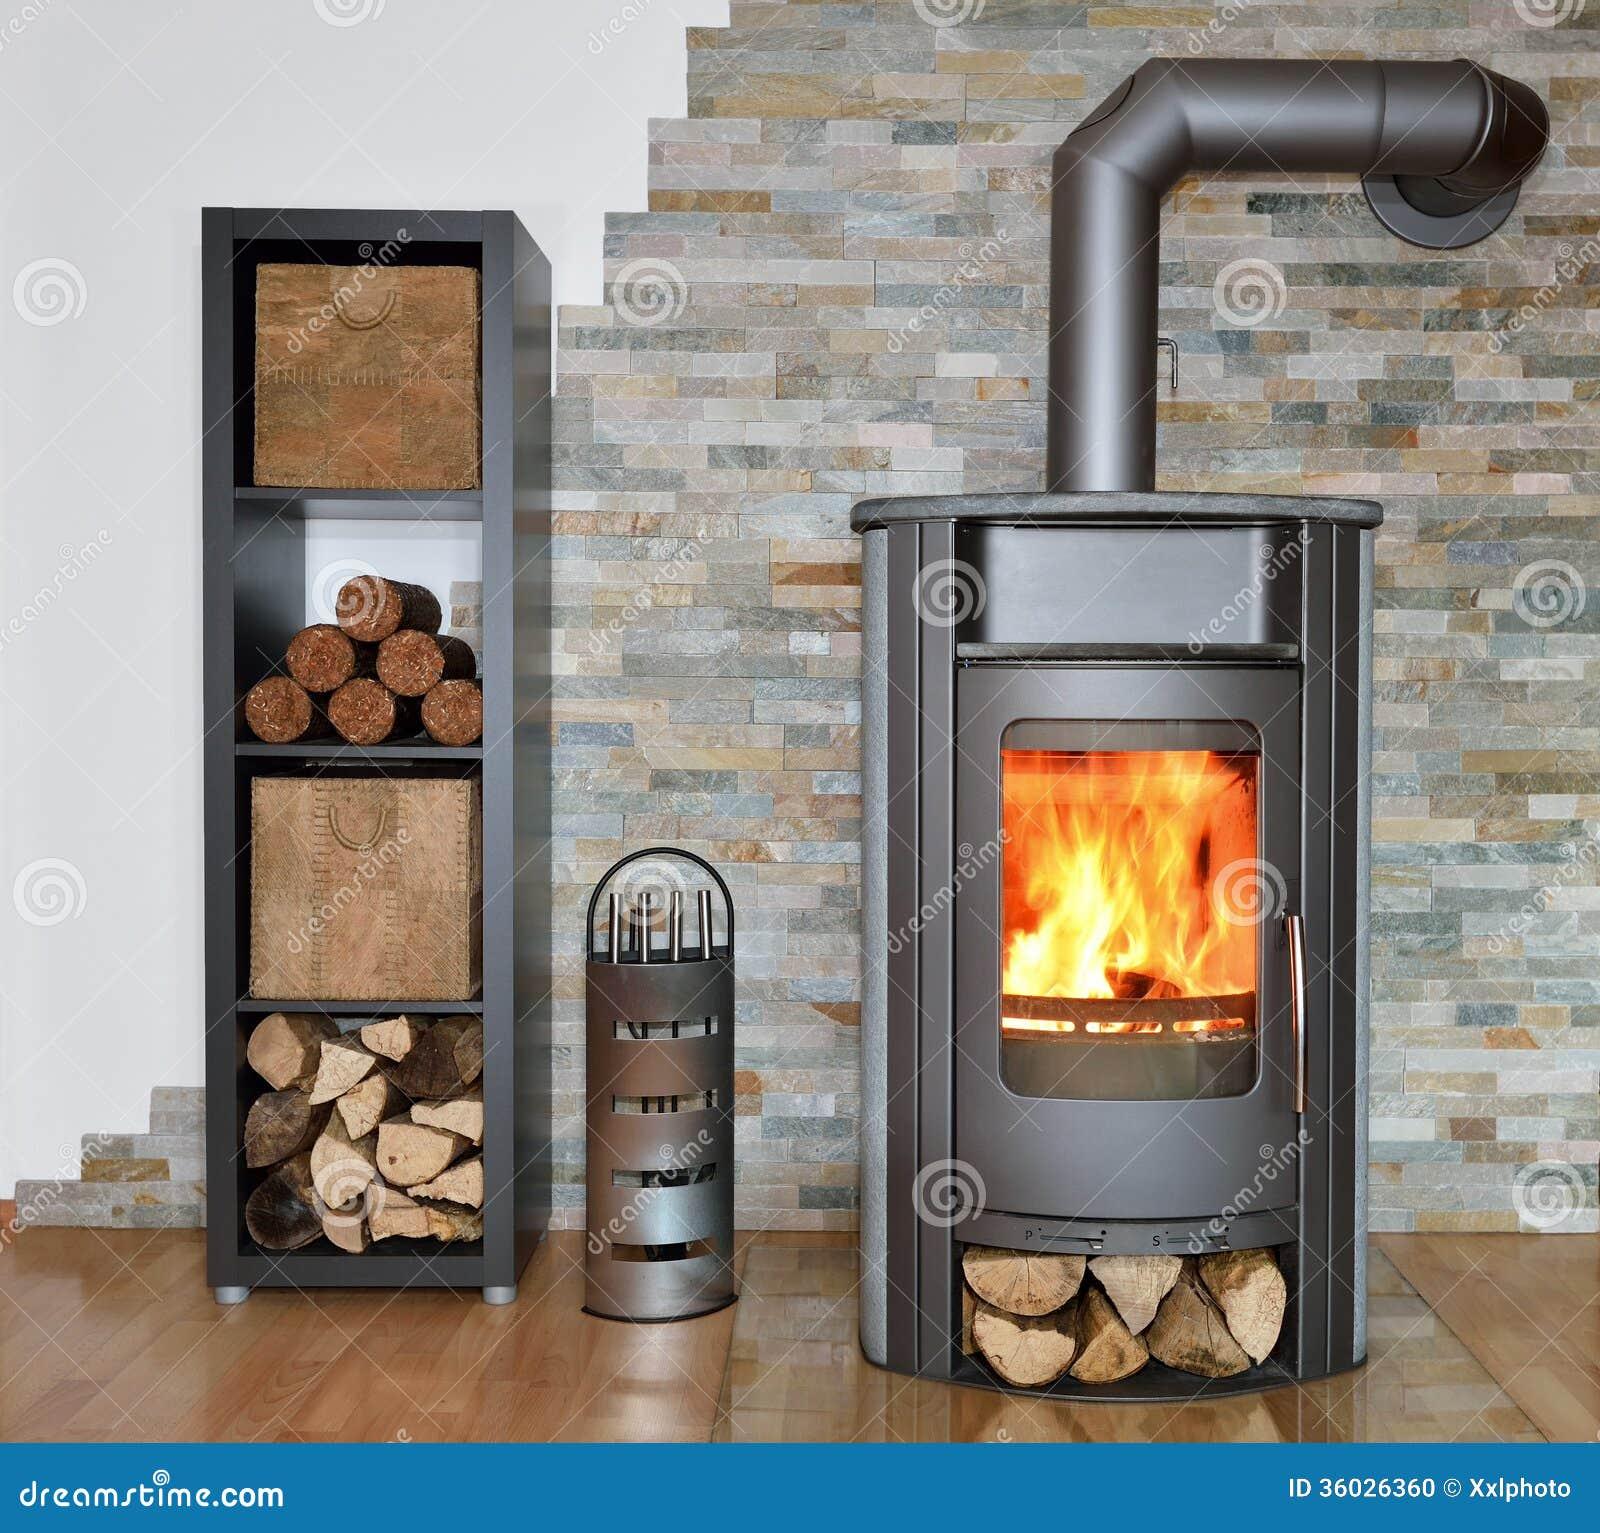 Estufa encendida madera foto de archivo imagen de - Foto estufa ...